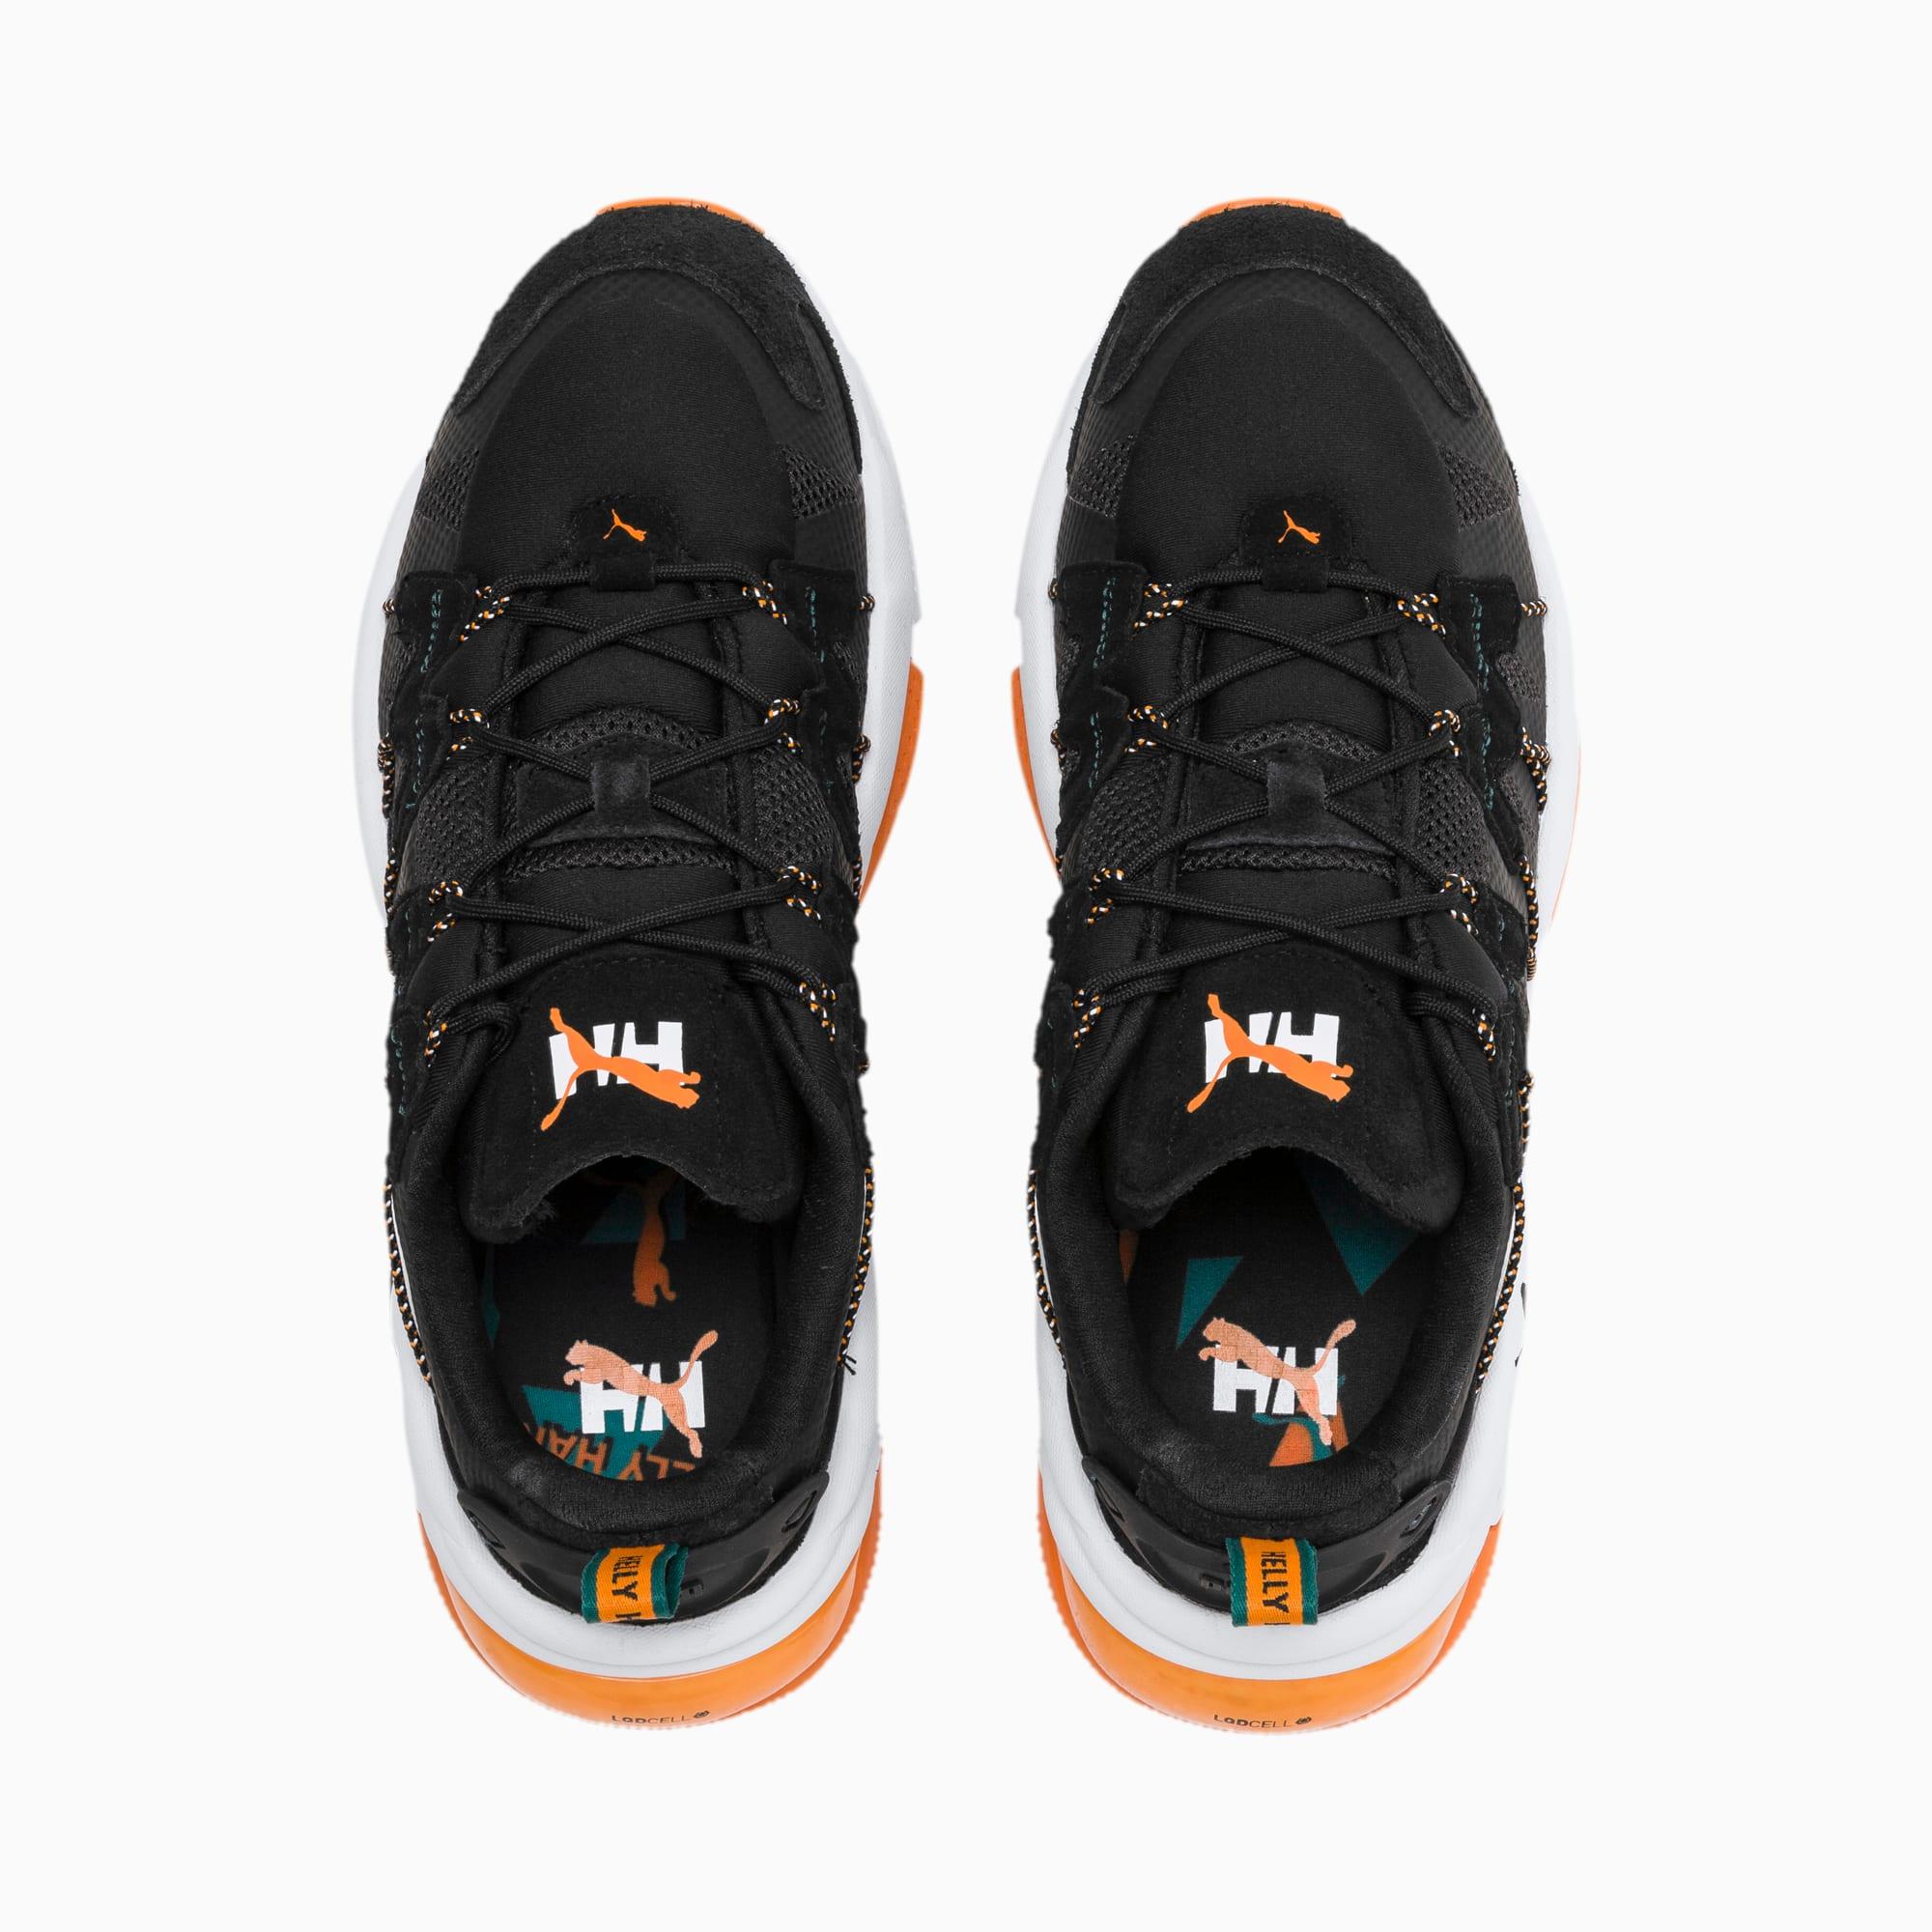 PUMA x HELLY HANSEN LQDCELL Omega Training Shoes